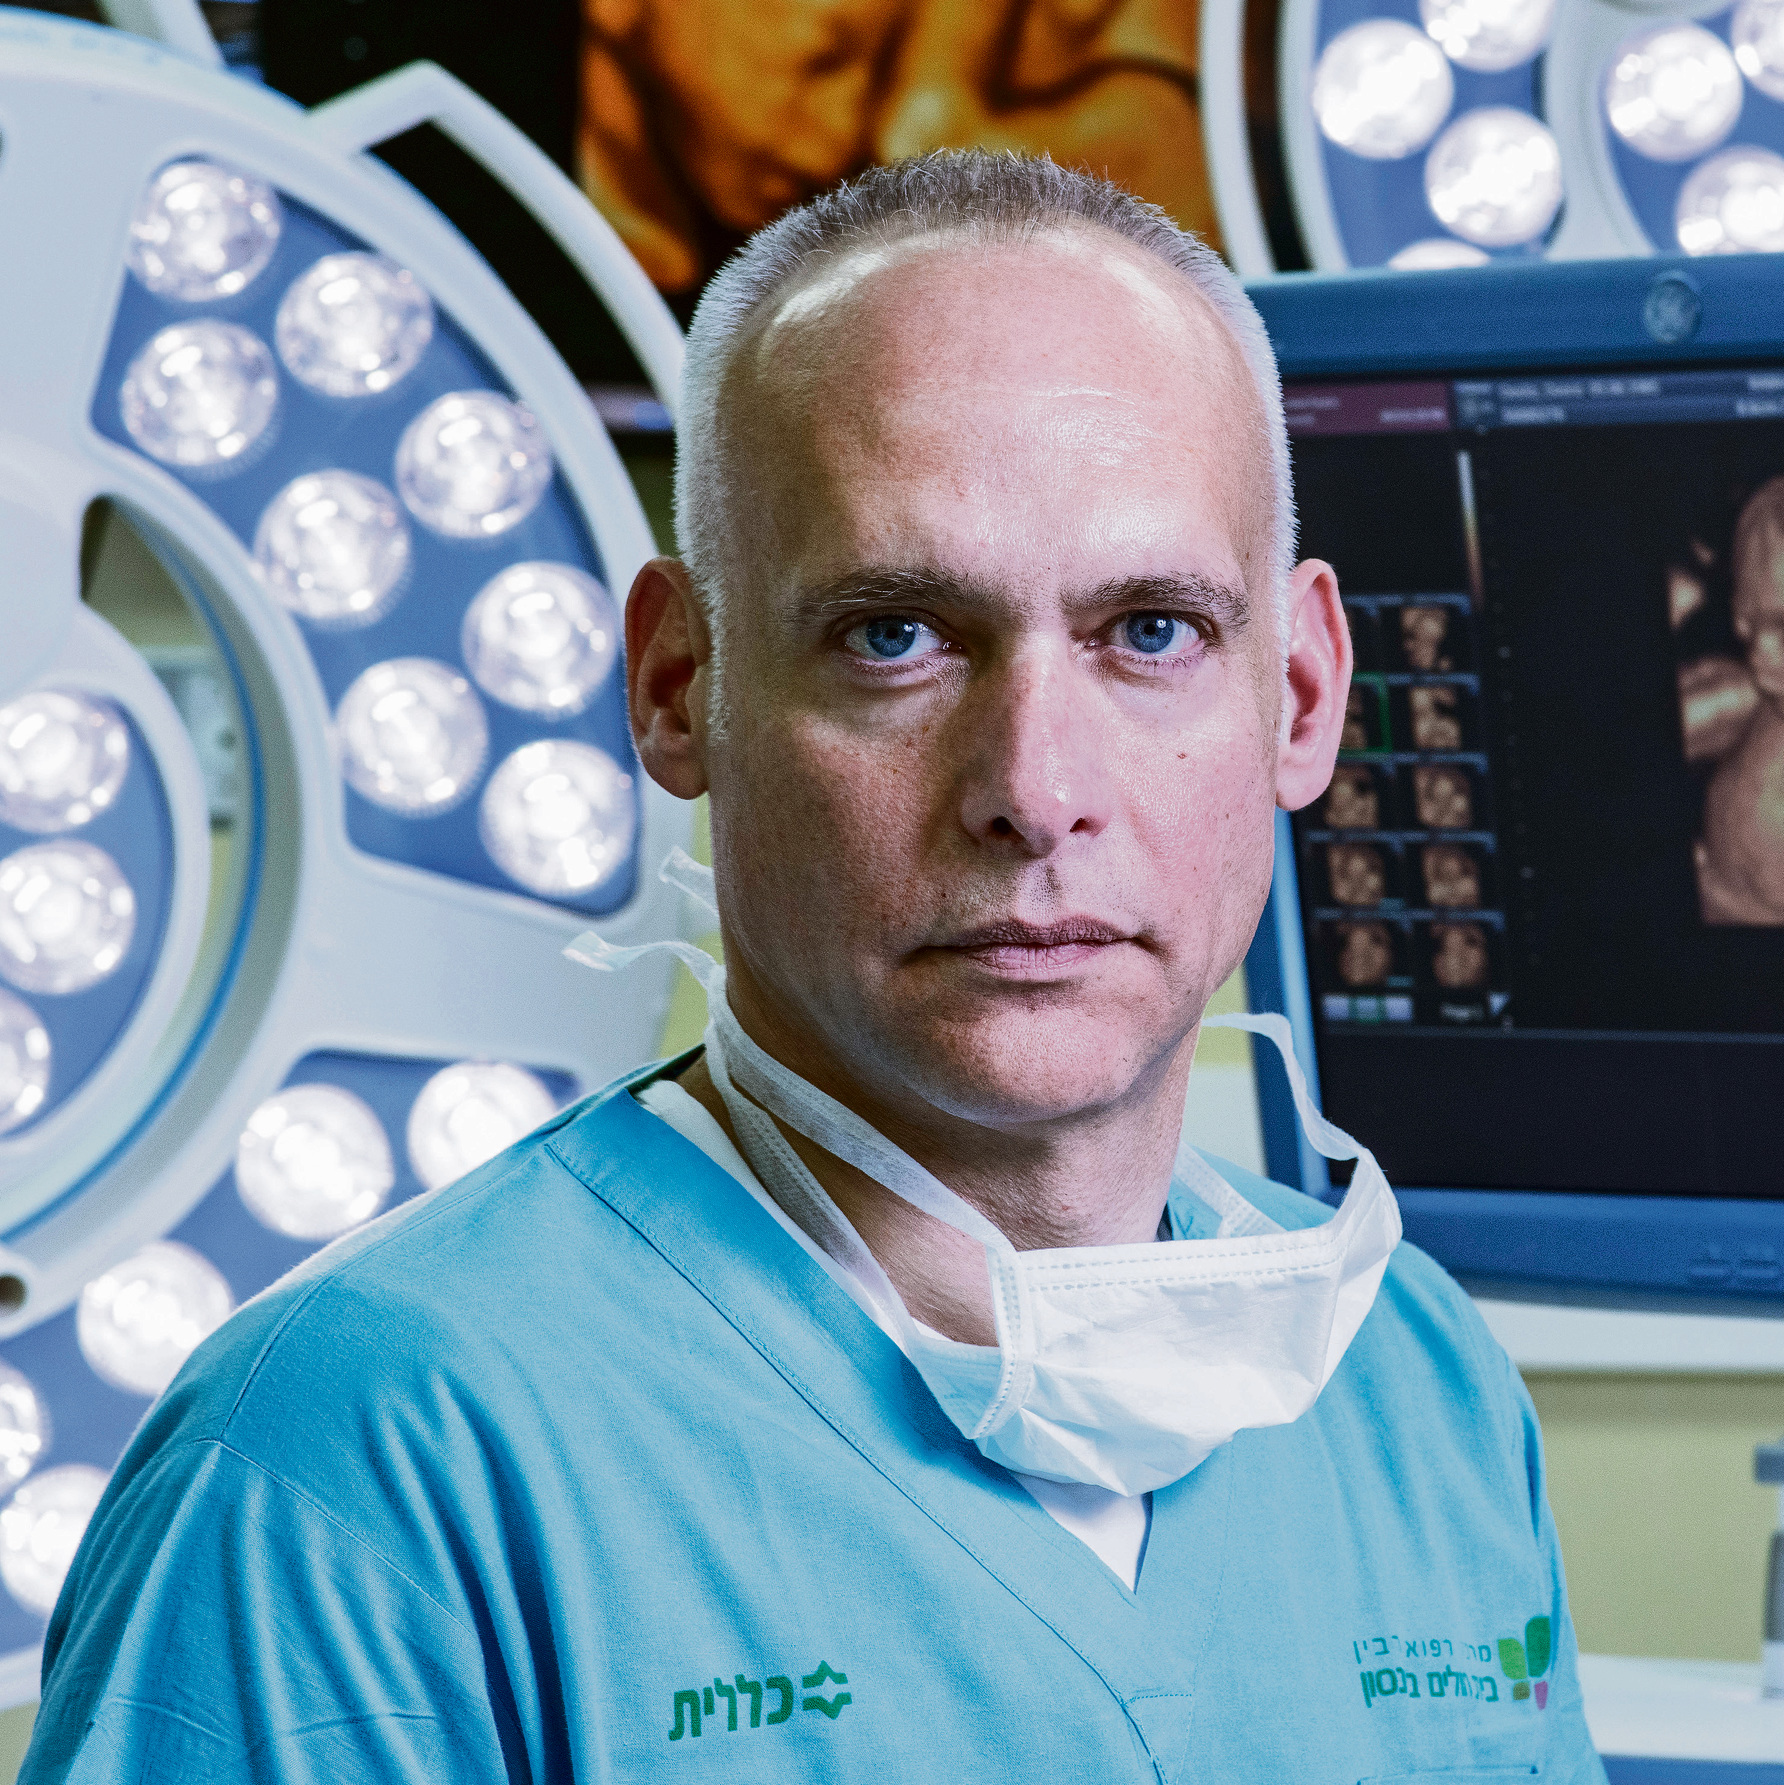 Д-р Юваль Гиалчински. Фото: Юваль Хен